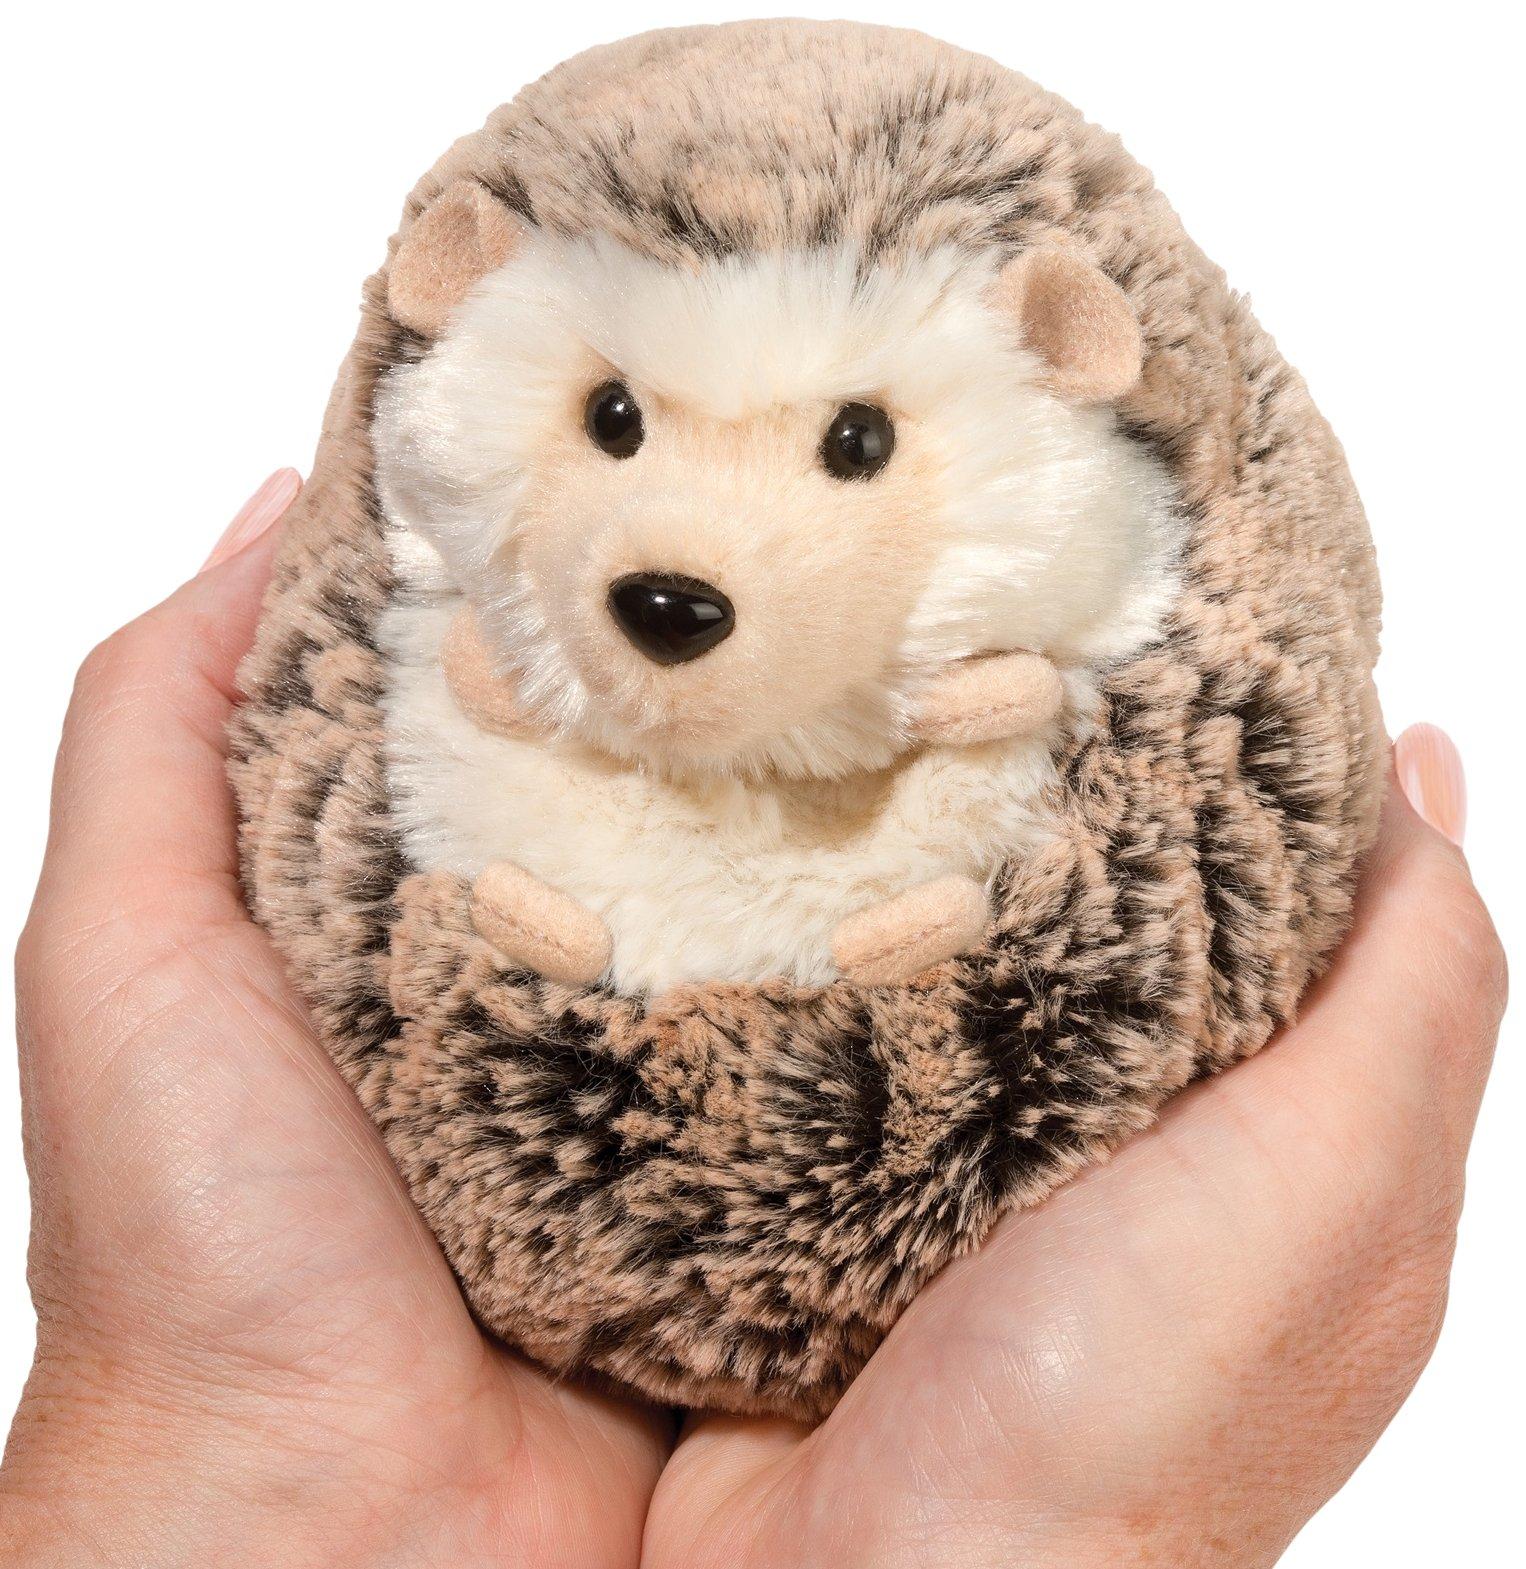 Douglas Spunky Hedgehog Plush Stuffed Animal